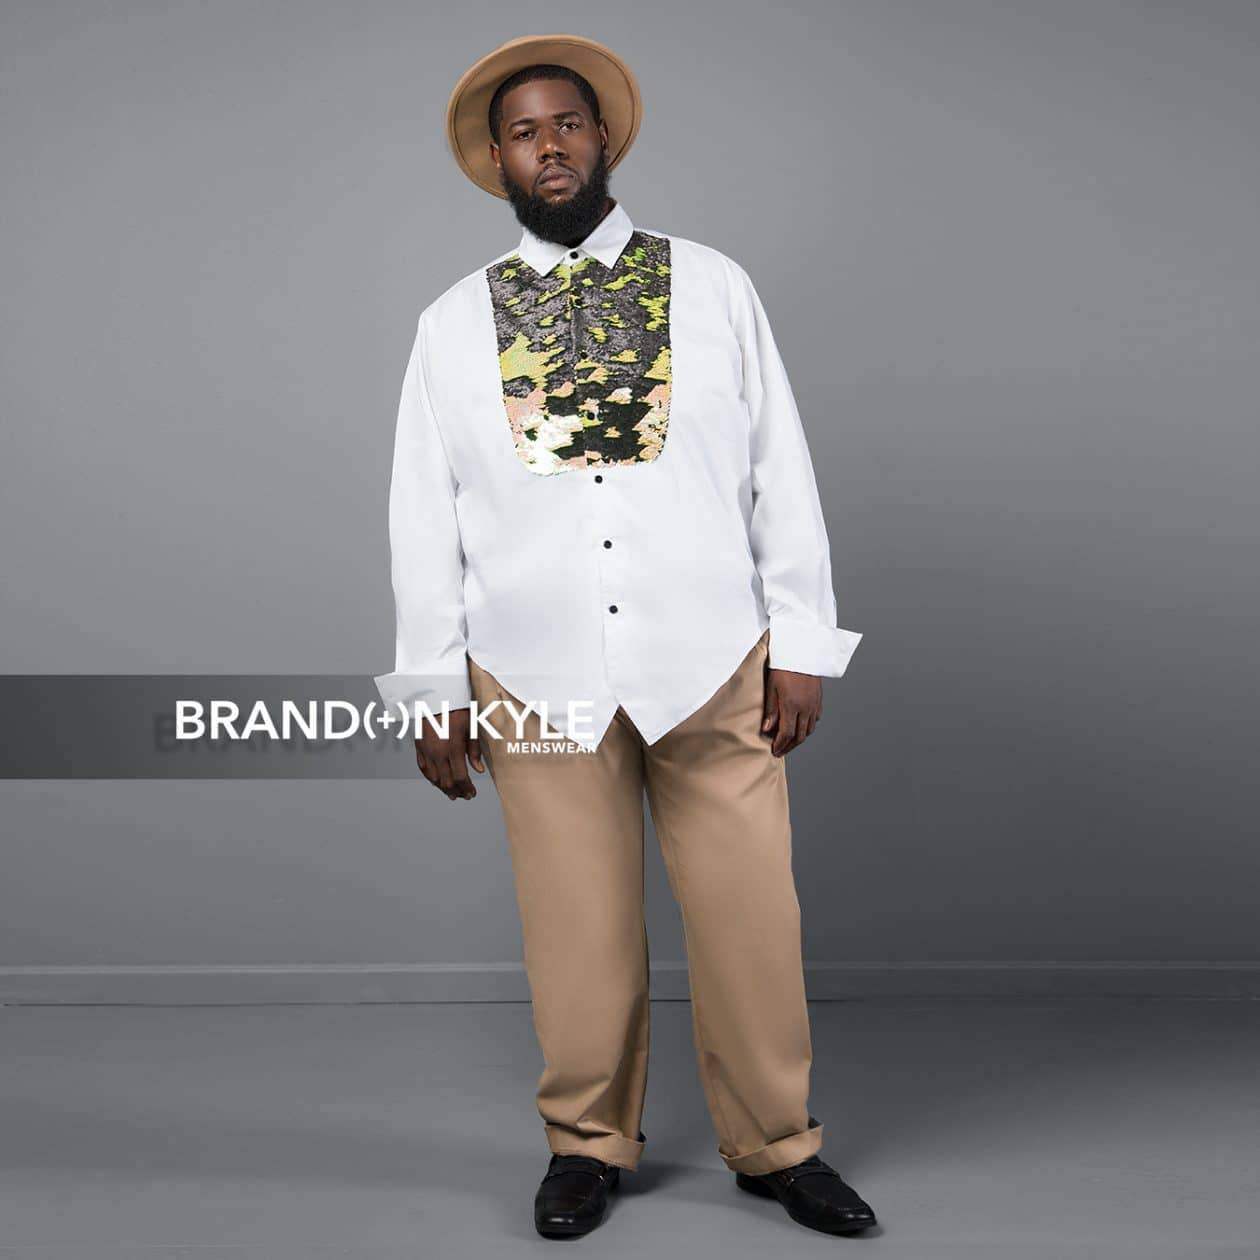 Brandon Kyle Plus Menswear- Tuxedo Shirt